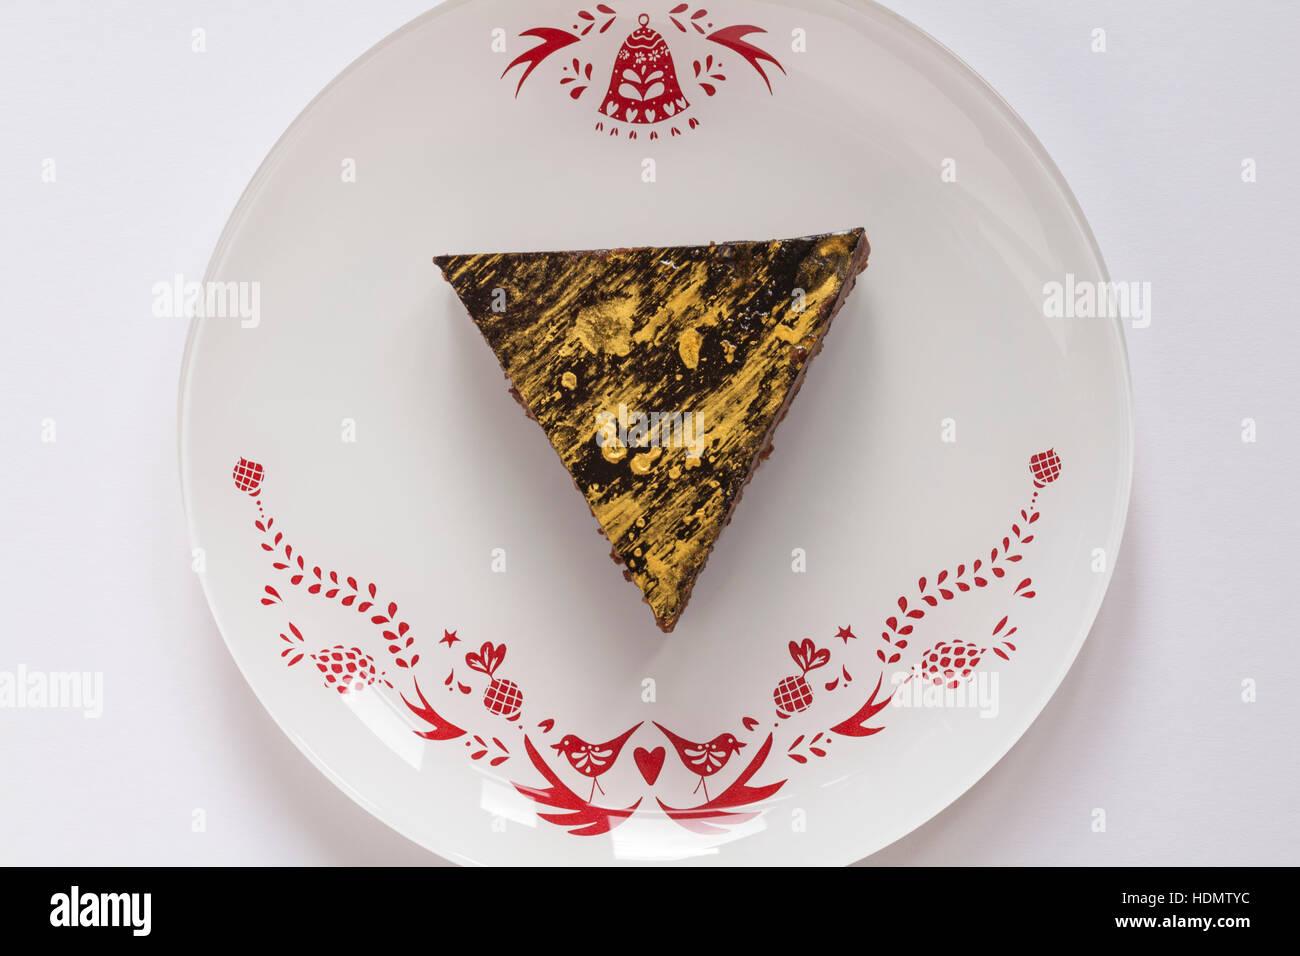 M&S Christmas Chocolate & Mandarin Desserts - mandarin dessert on festive plate Stock Photo